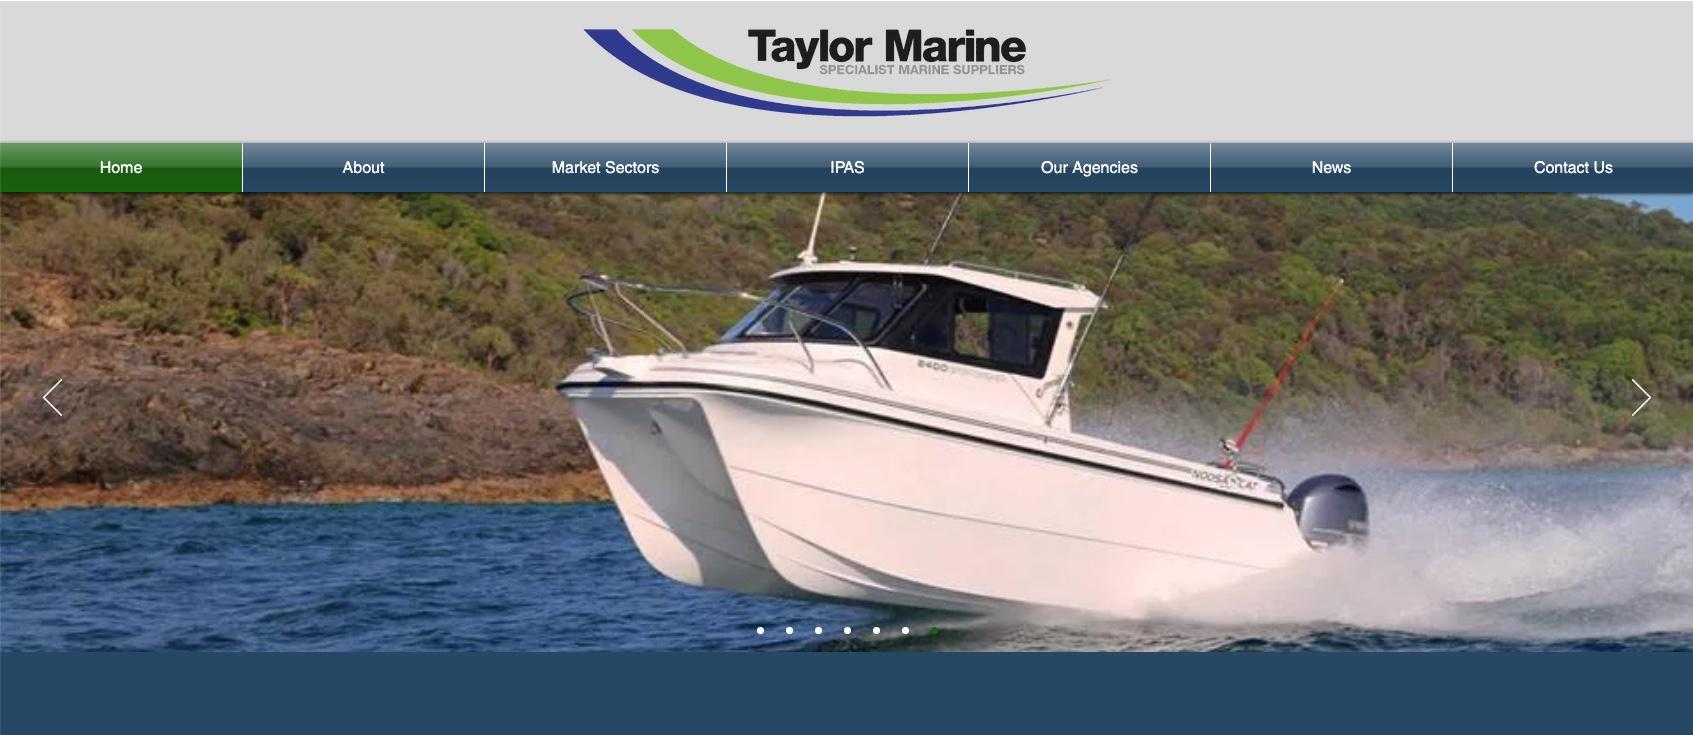 WestCorp Perth TaylorMarine1